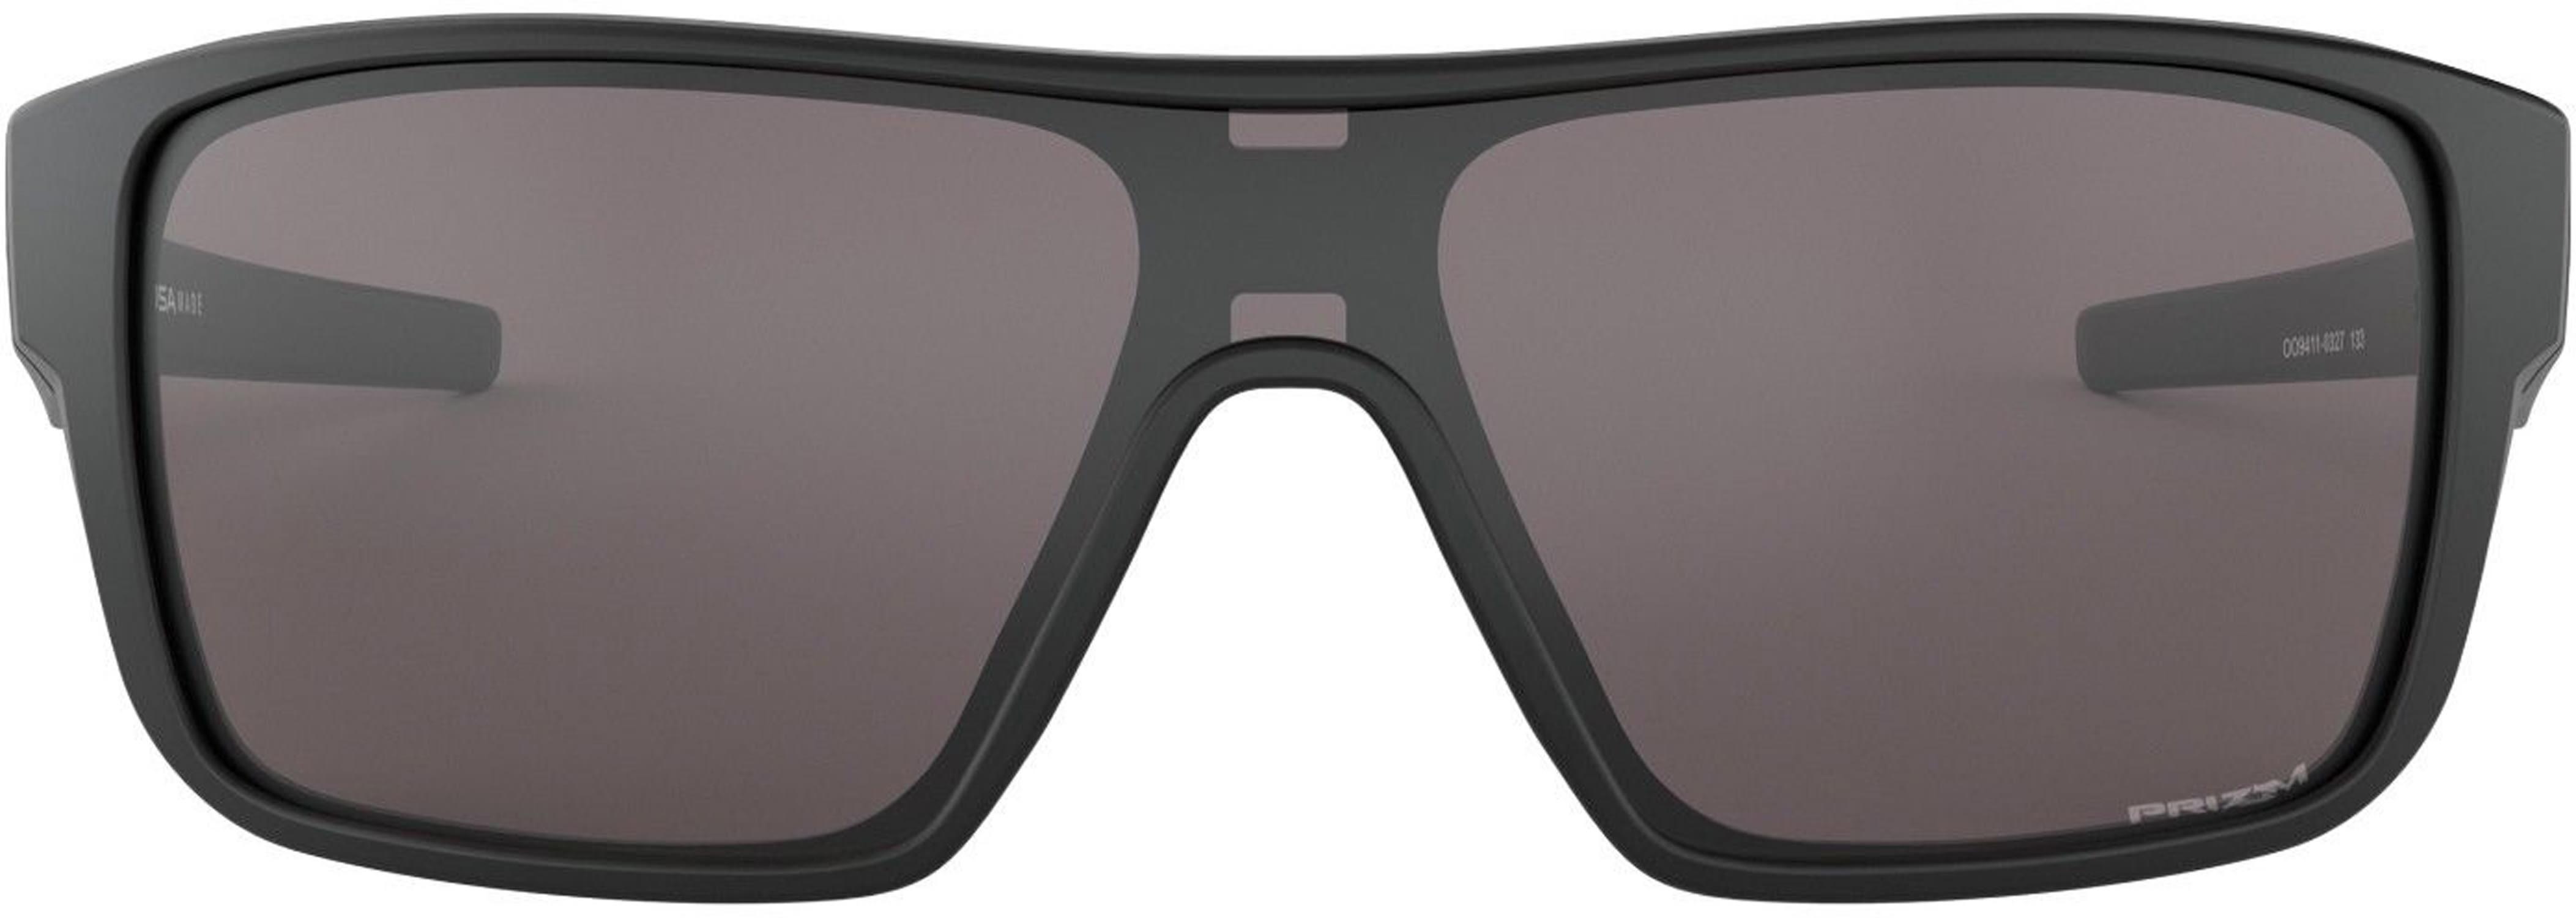 436f1f11e3 Oakley Straightback Sunglasses - thumbnail 2